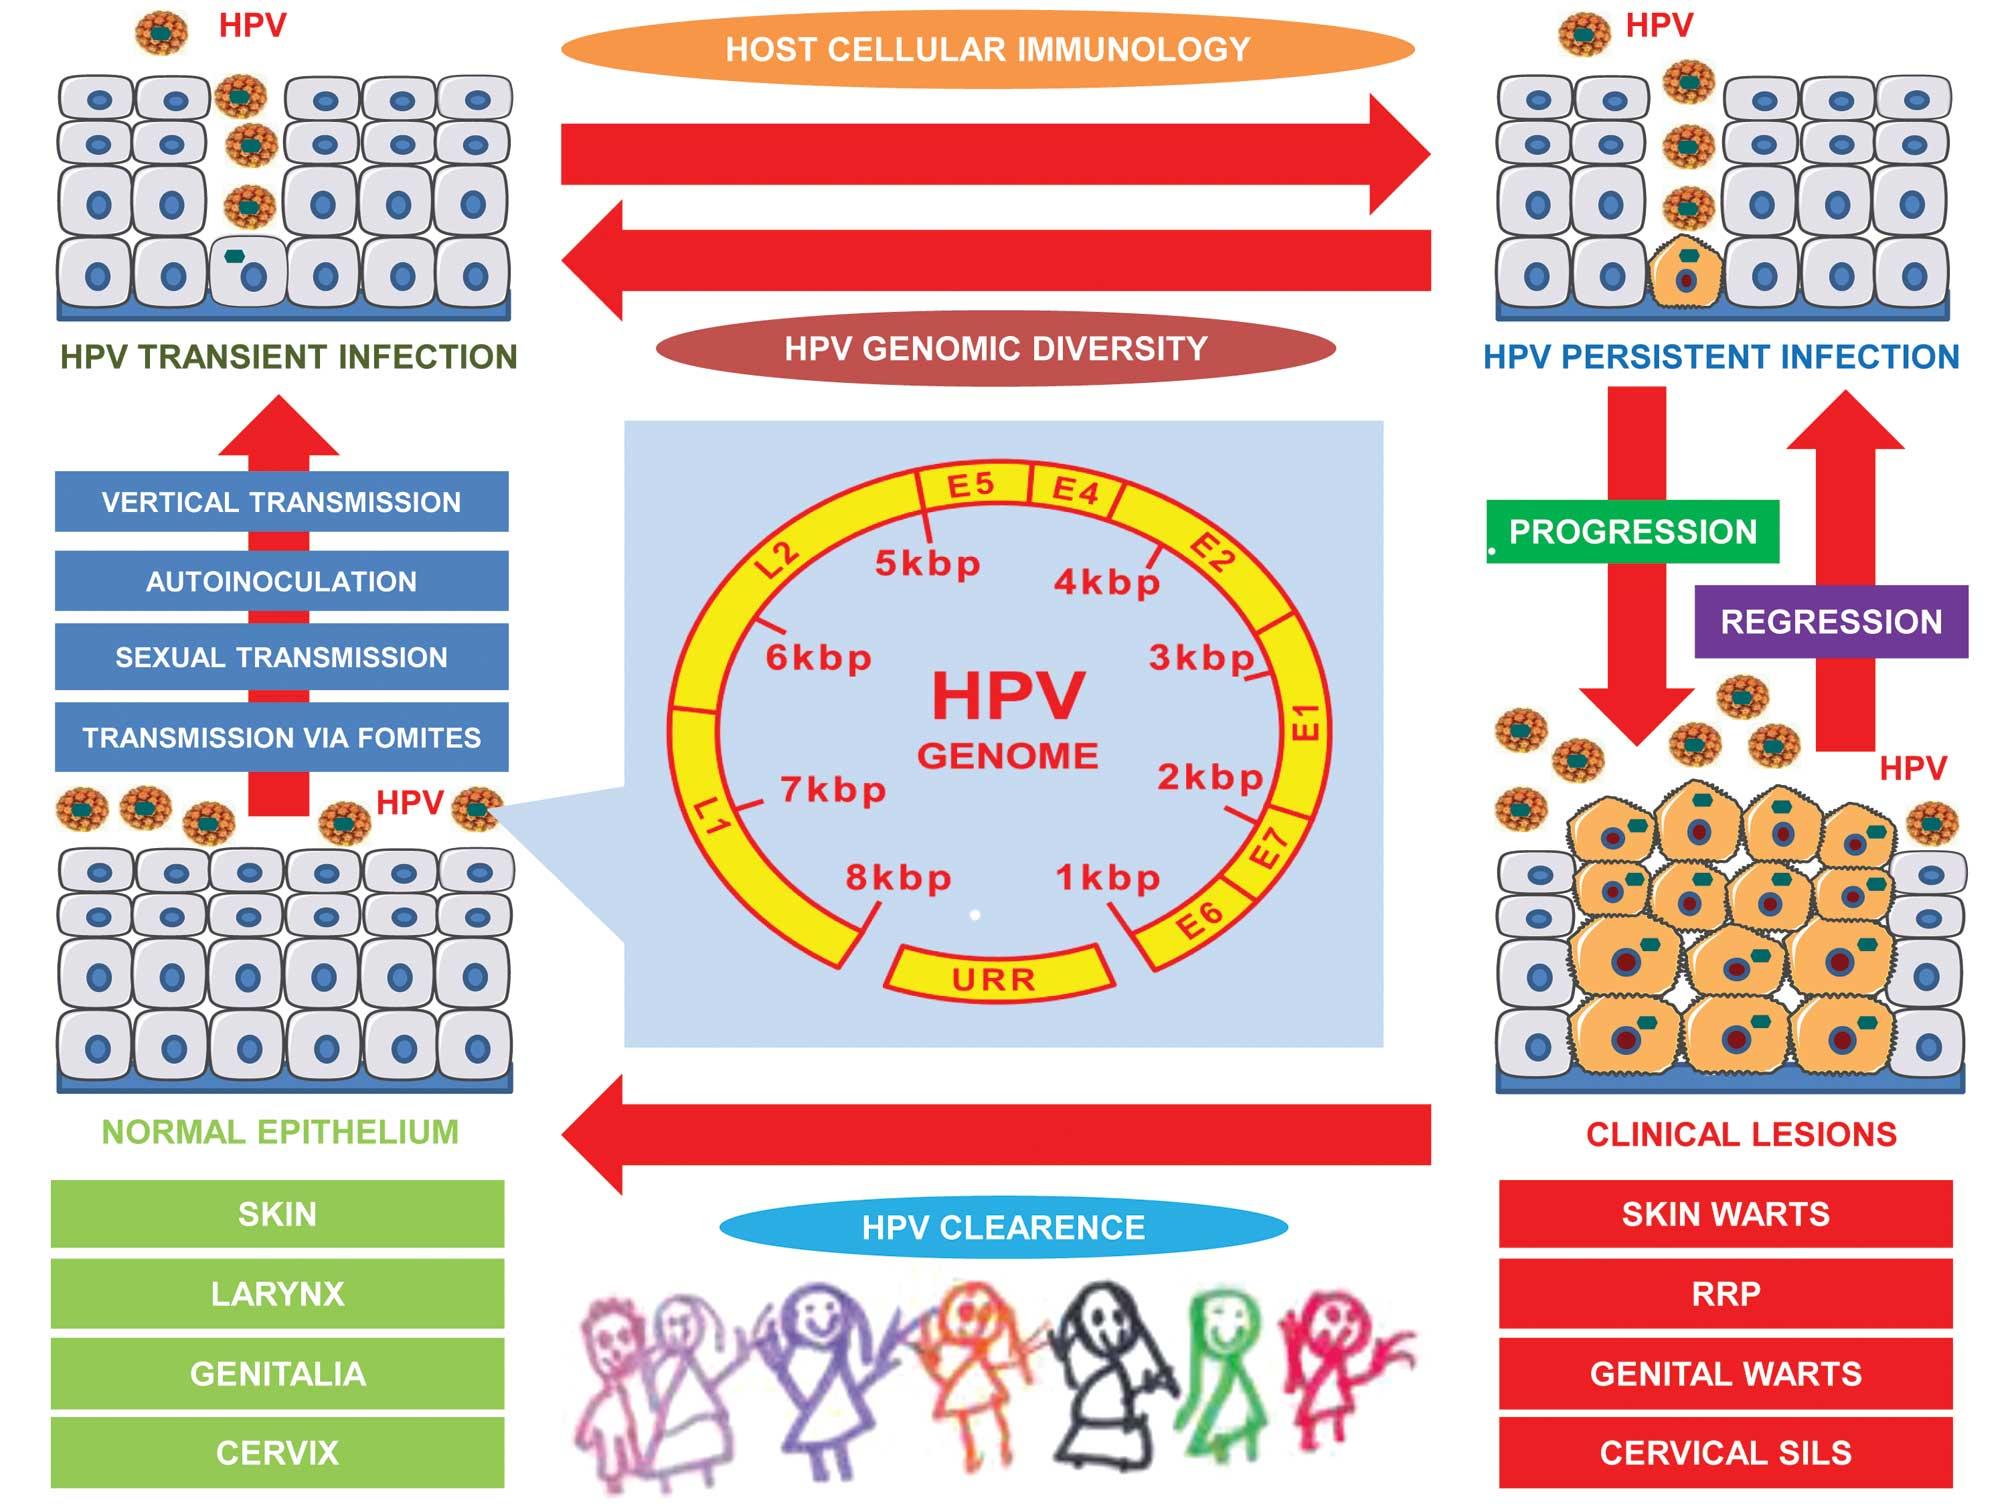 human papillomavirus transmission mode aceite de coco para los oxiuros